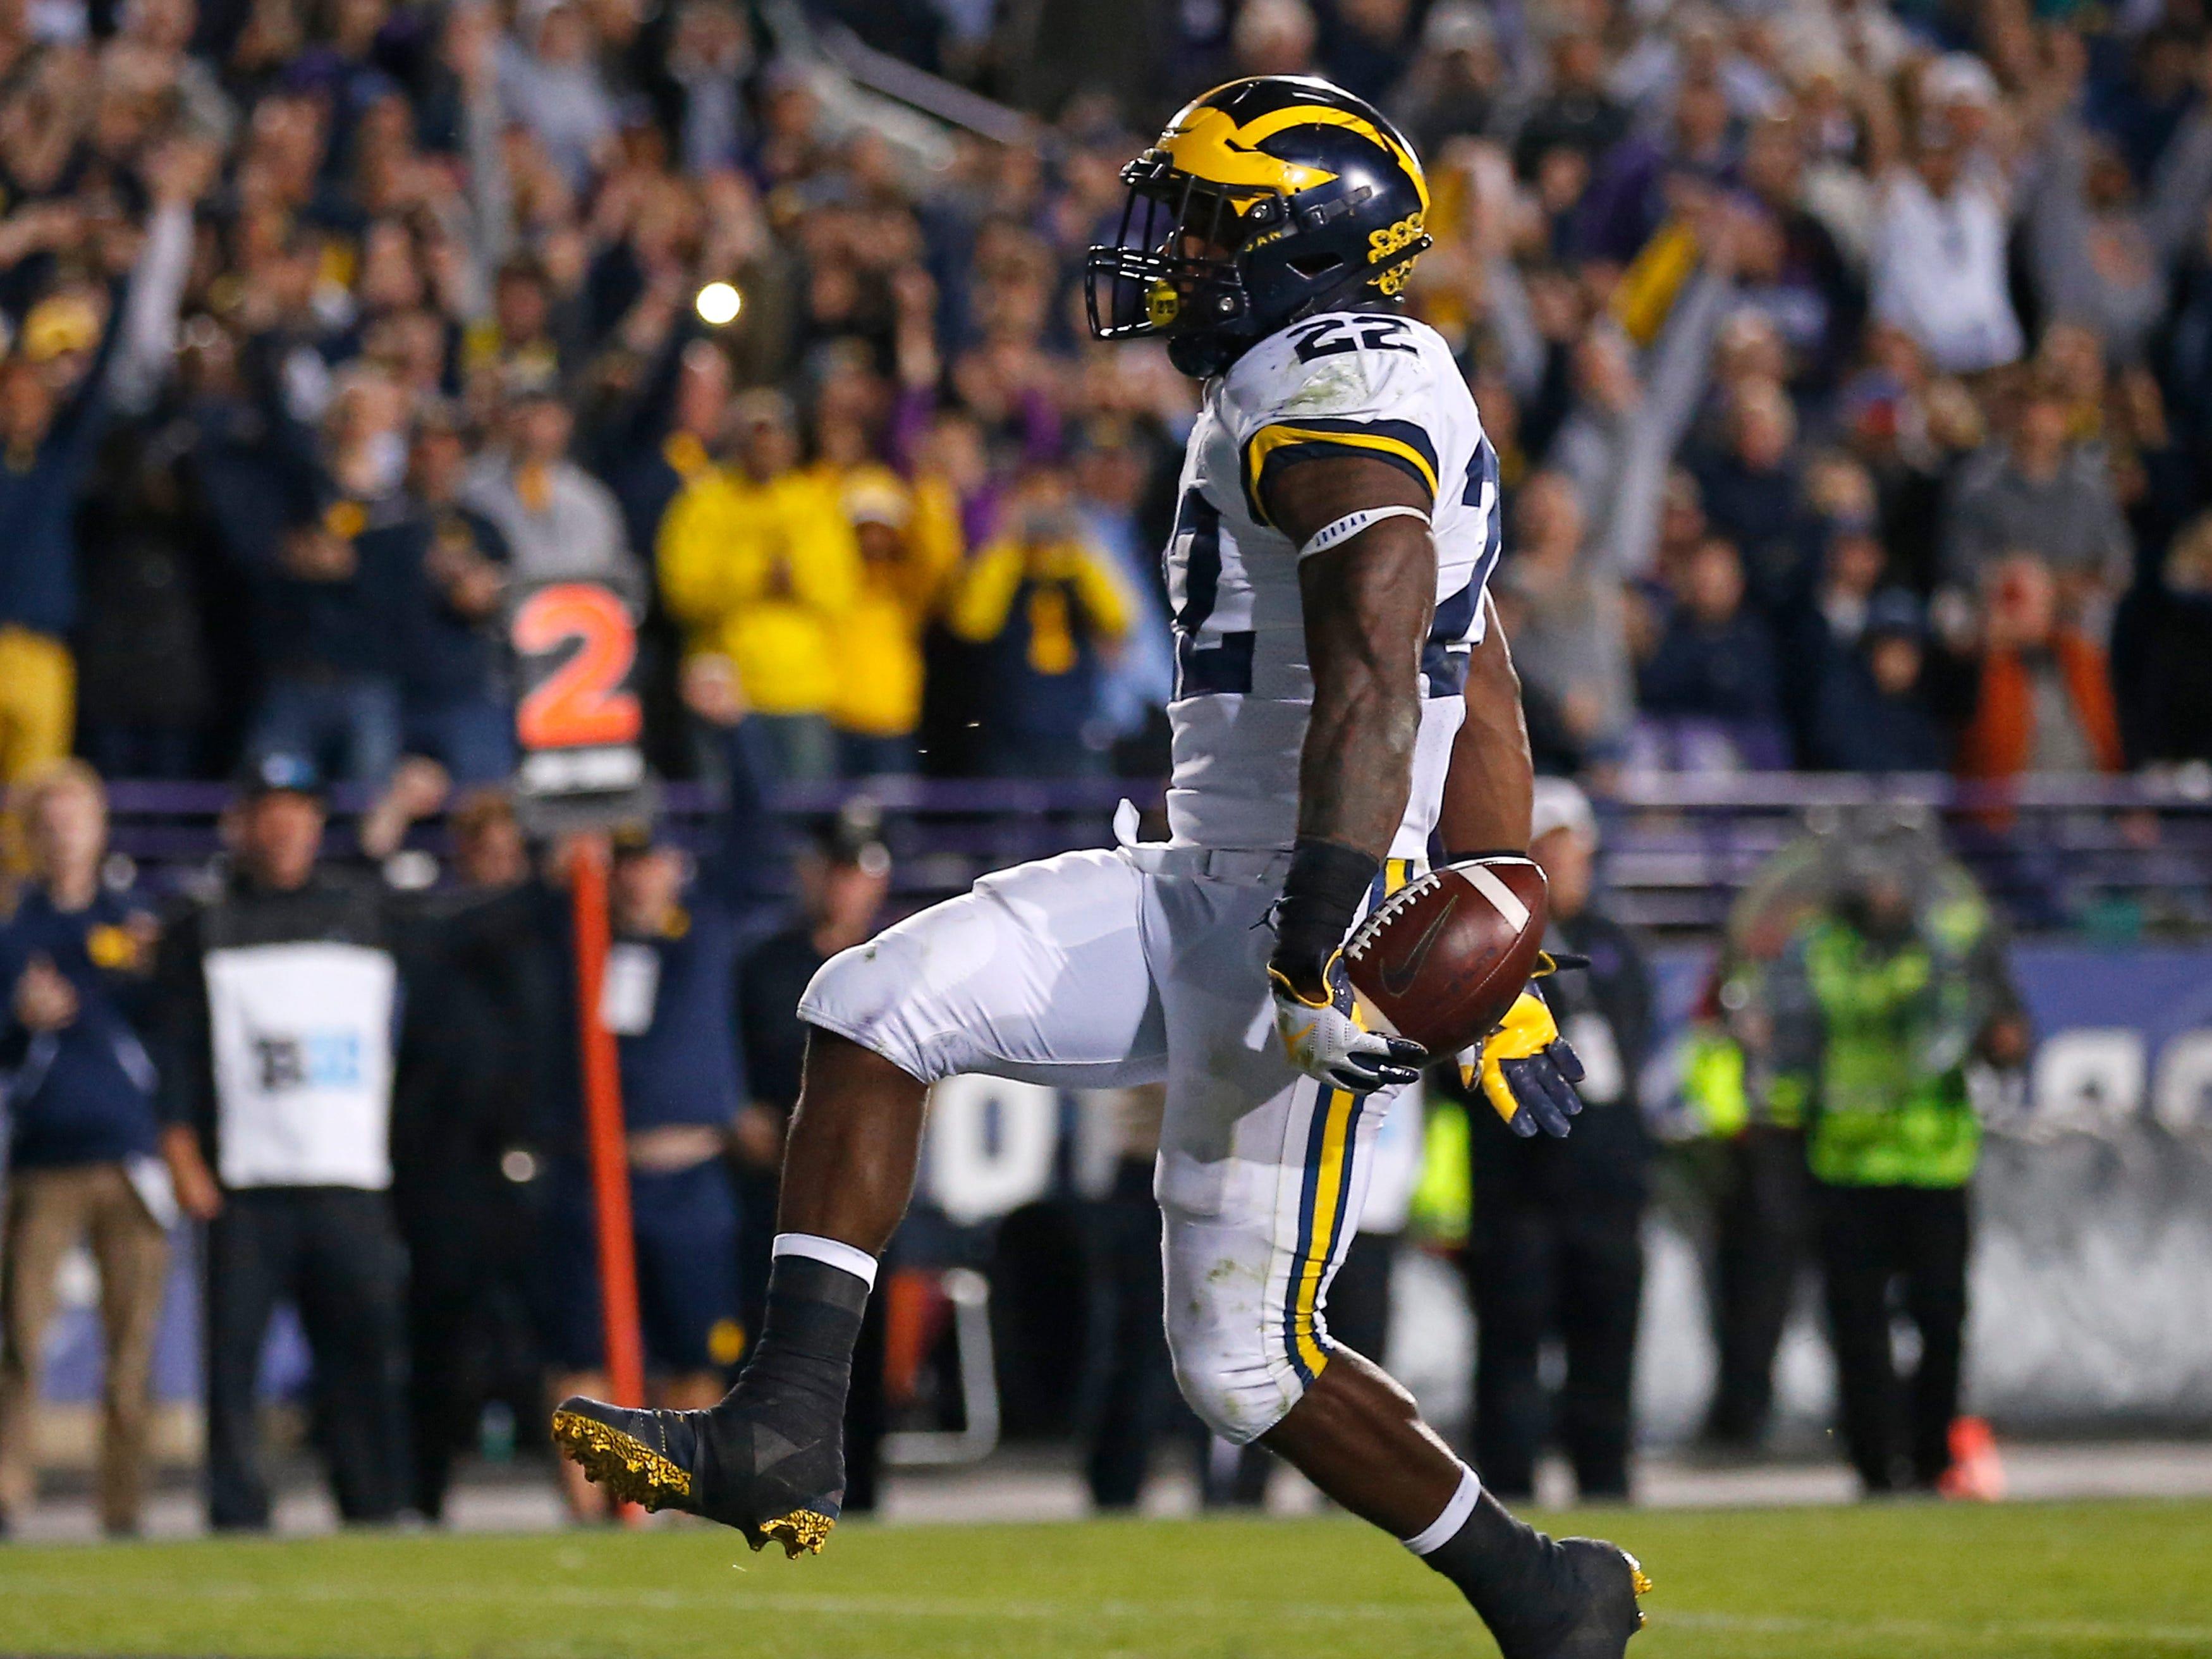 Michigan's Karan Higdon scores the go-ahead touchdown against Northwestern during the fourth quarter Saturday, Sept. 29, 2018, in Evanston, Ill.